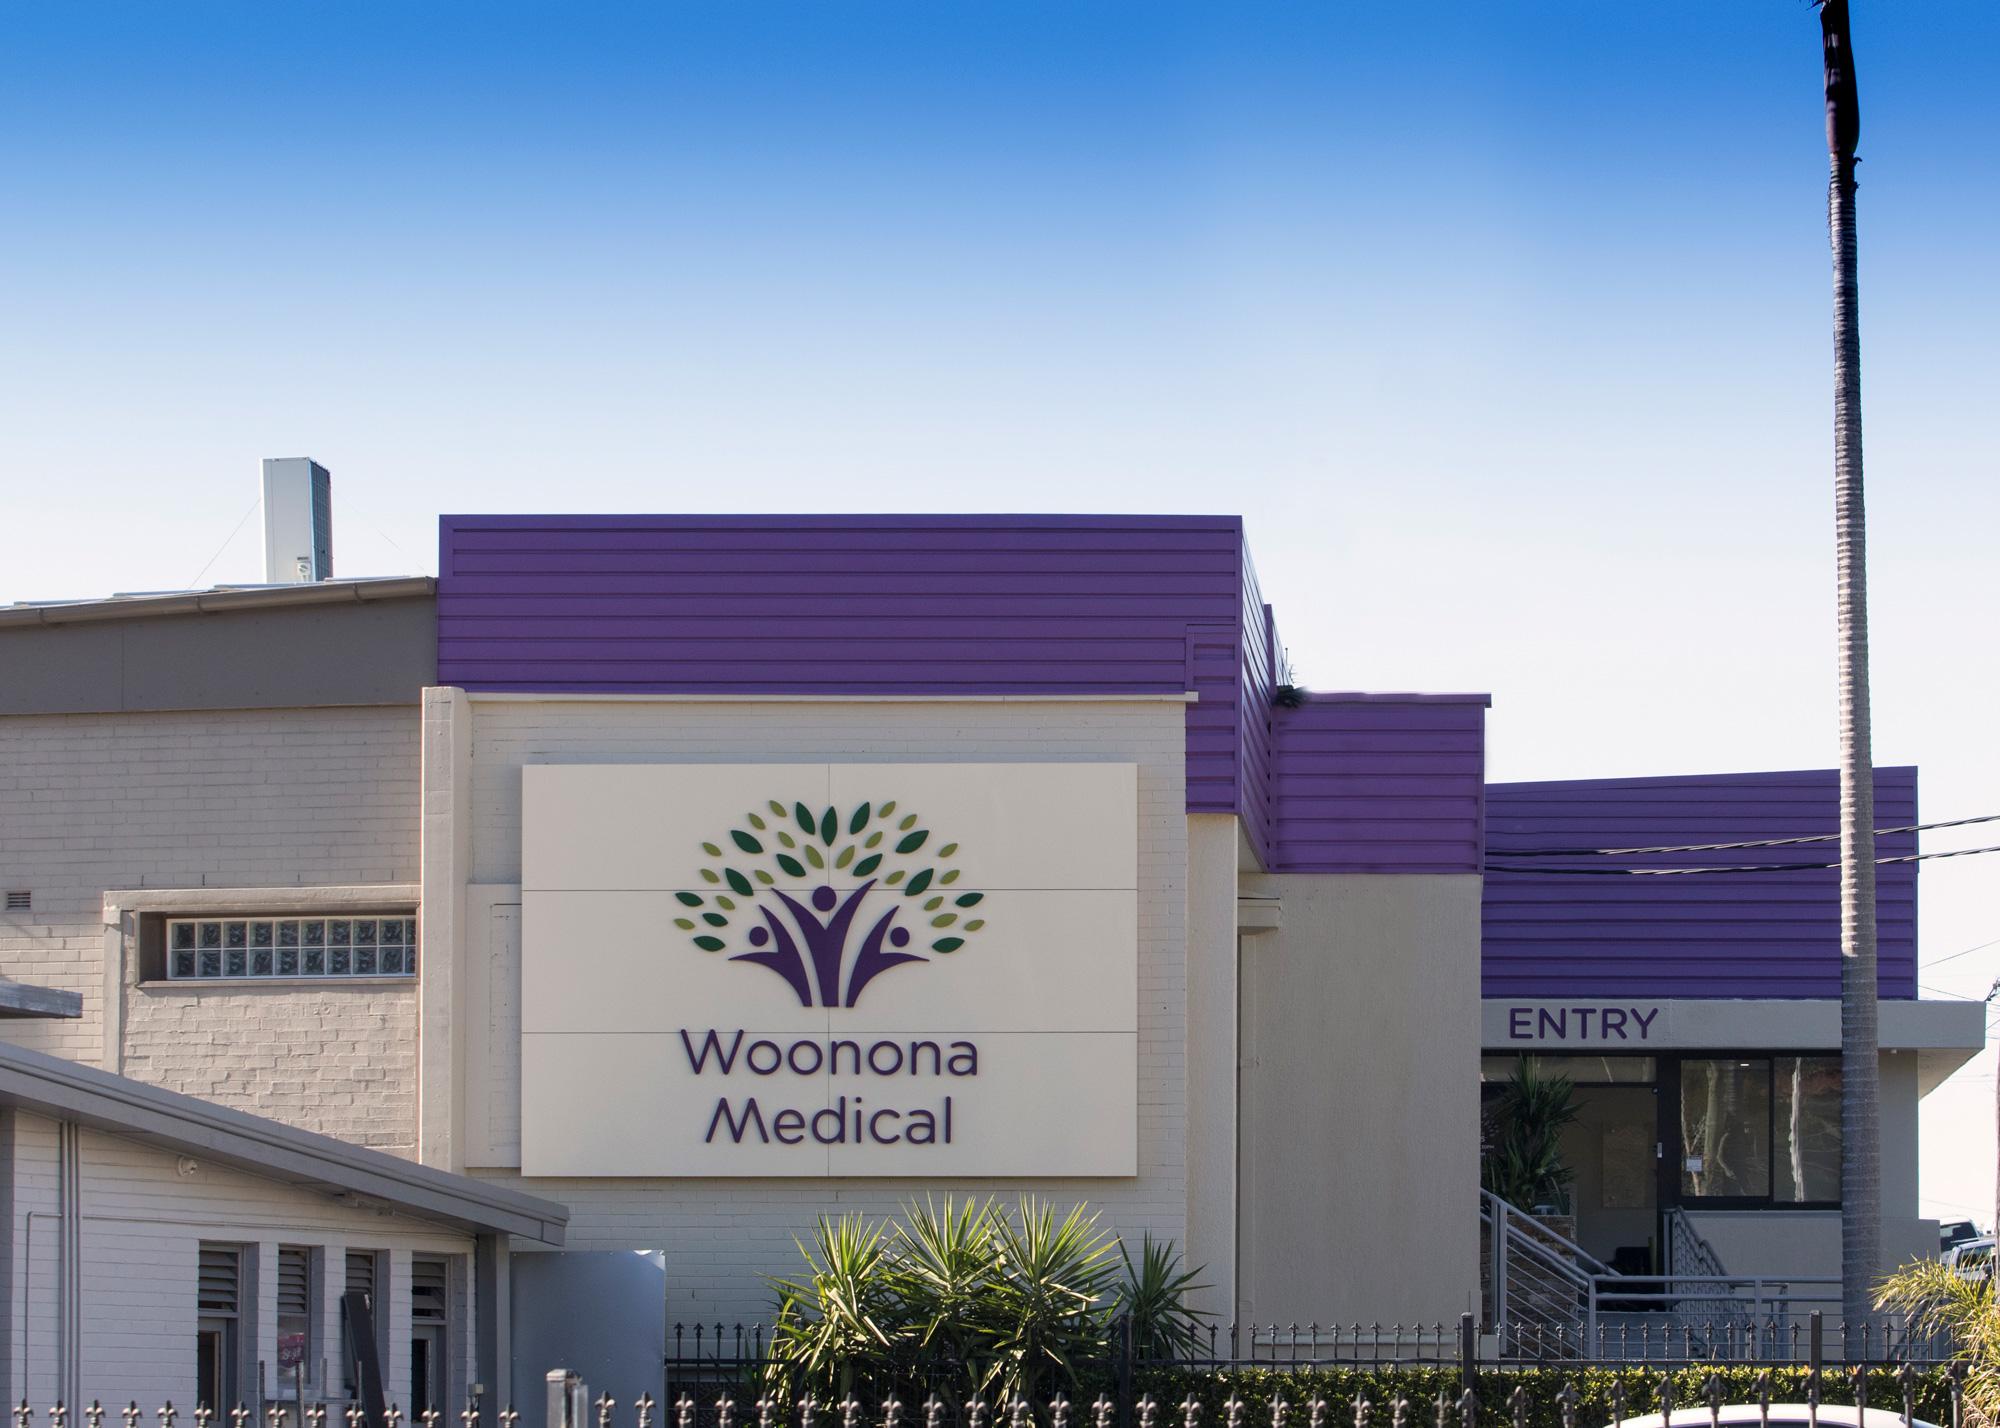 Woonona Medical. Signage & Design by Visual Energy